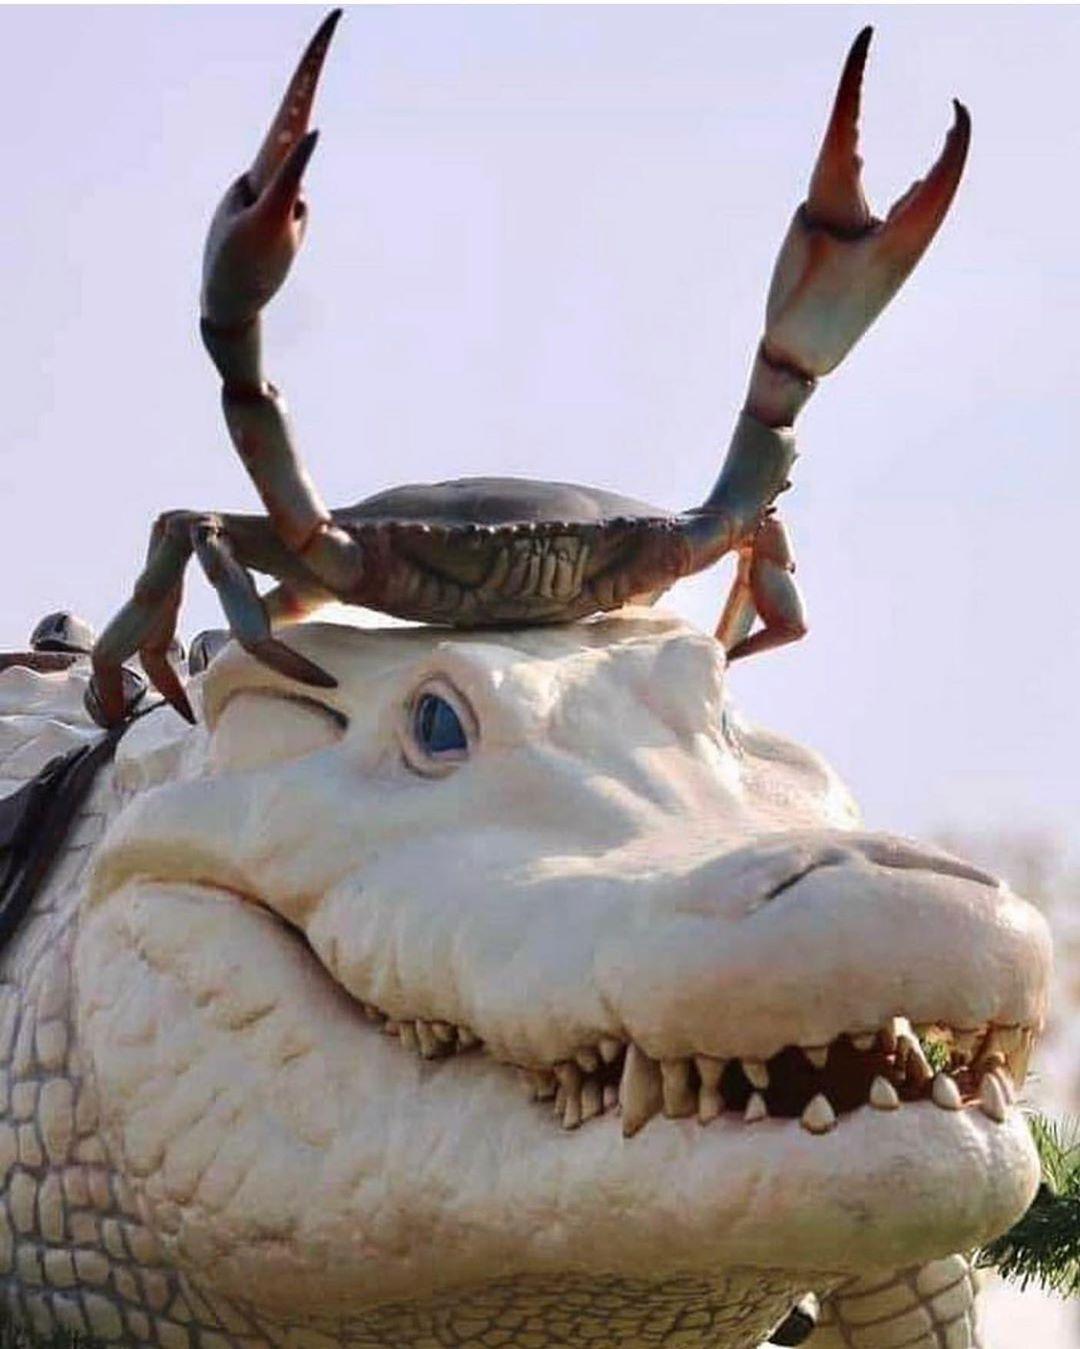 Alligator statue in Morgan City, Louisiana | ArtyPin